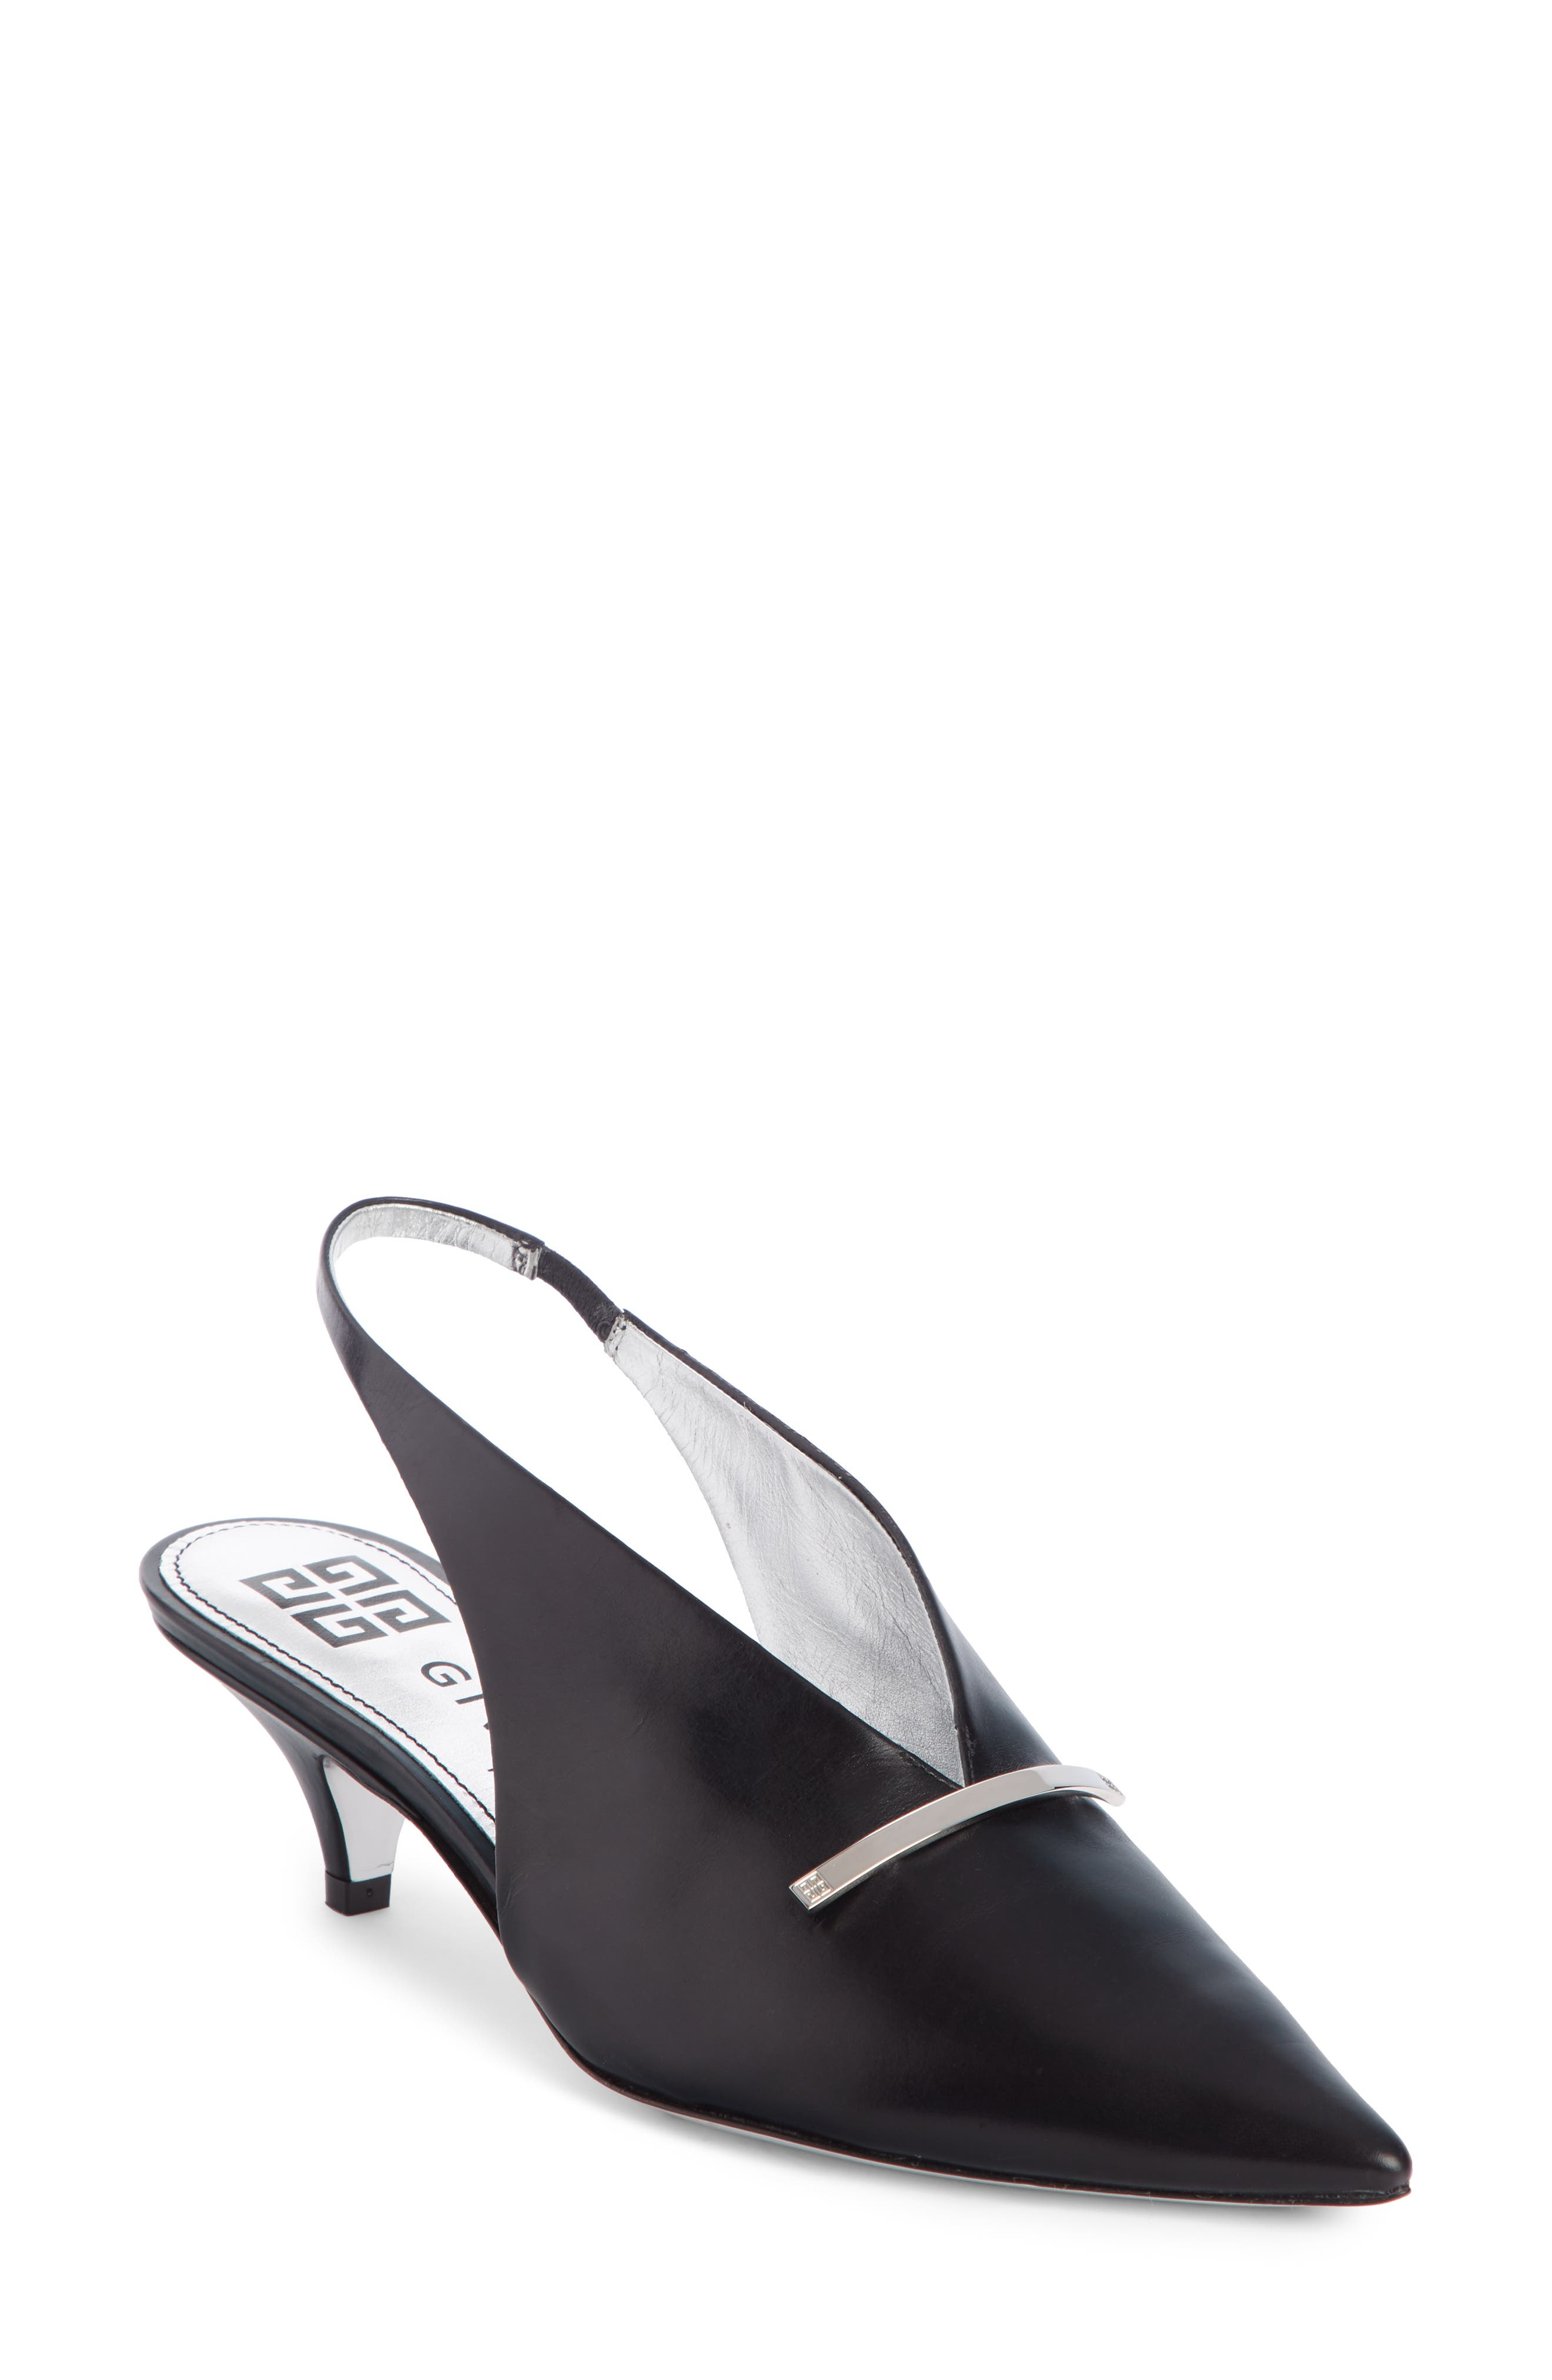 Givenchy Logo Bar Slingback Pump - Black